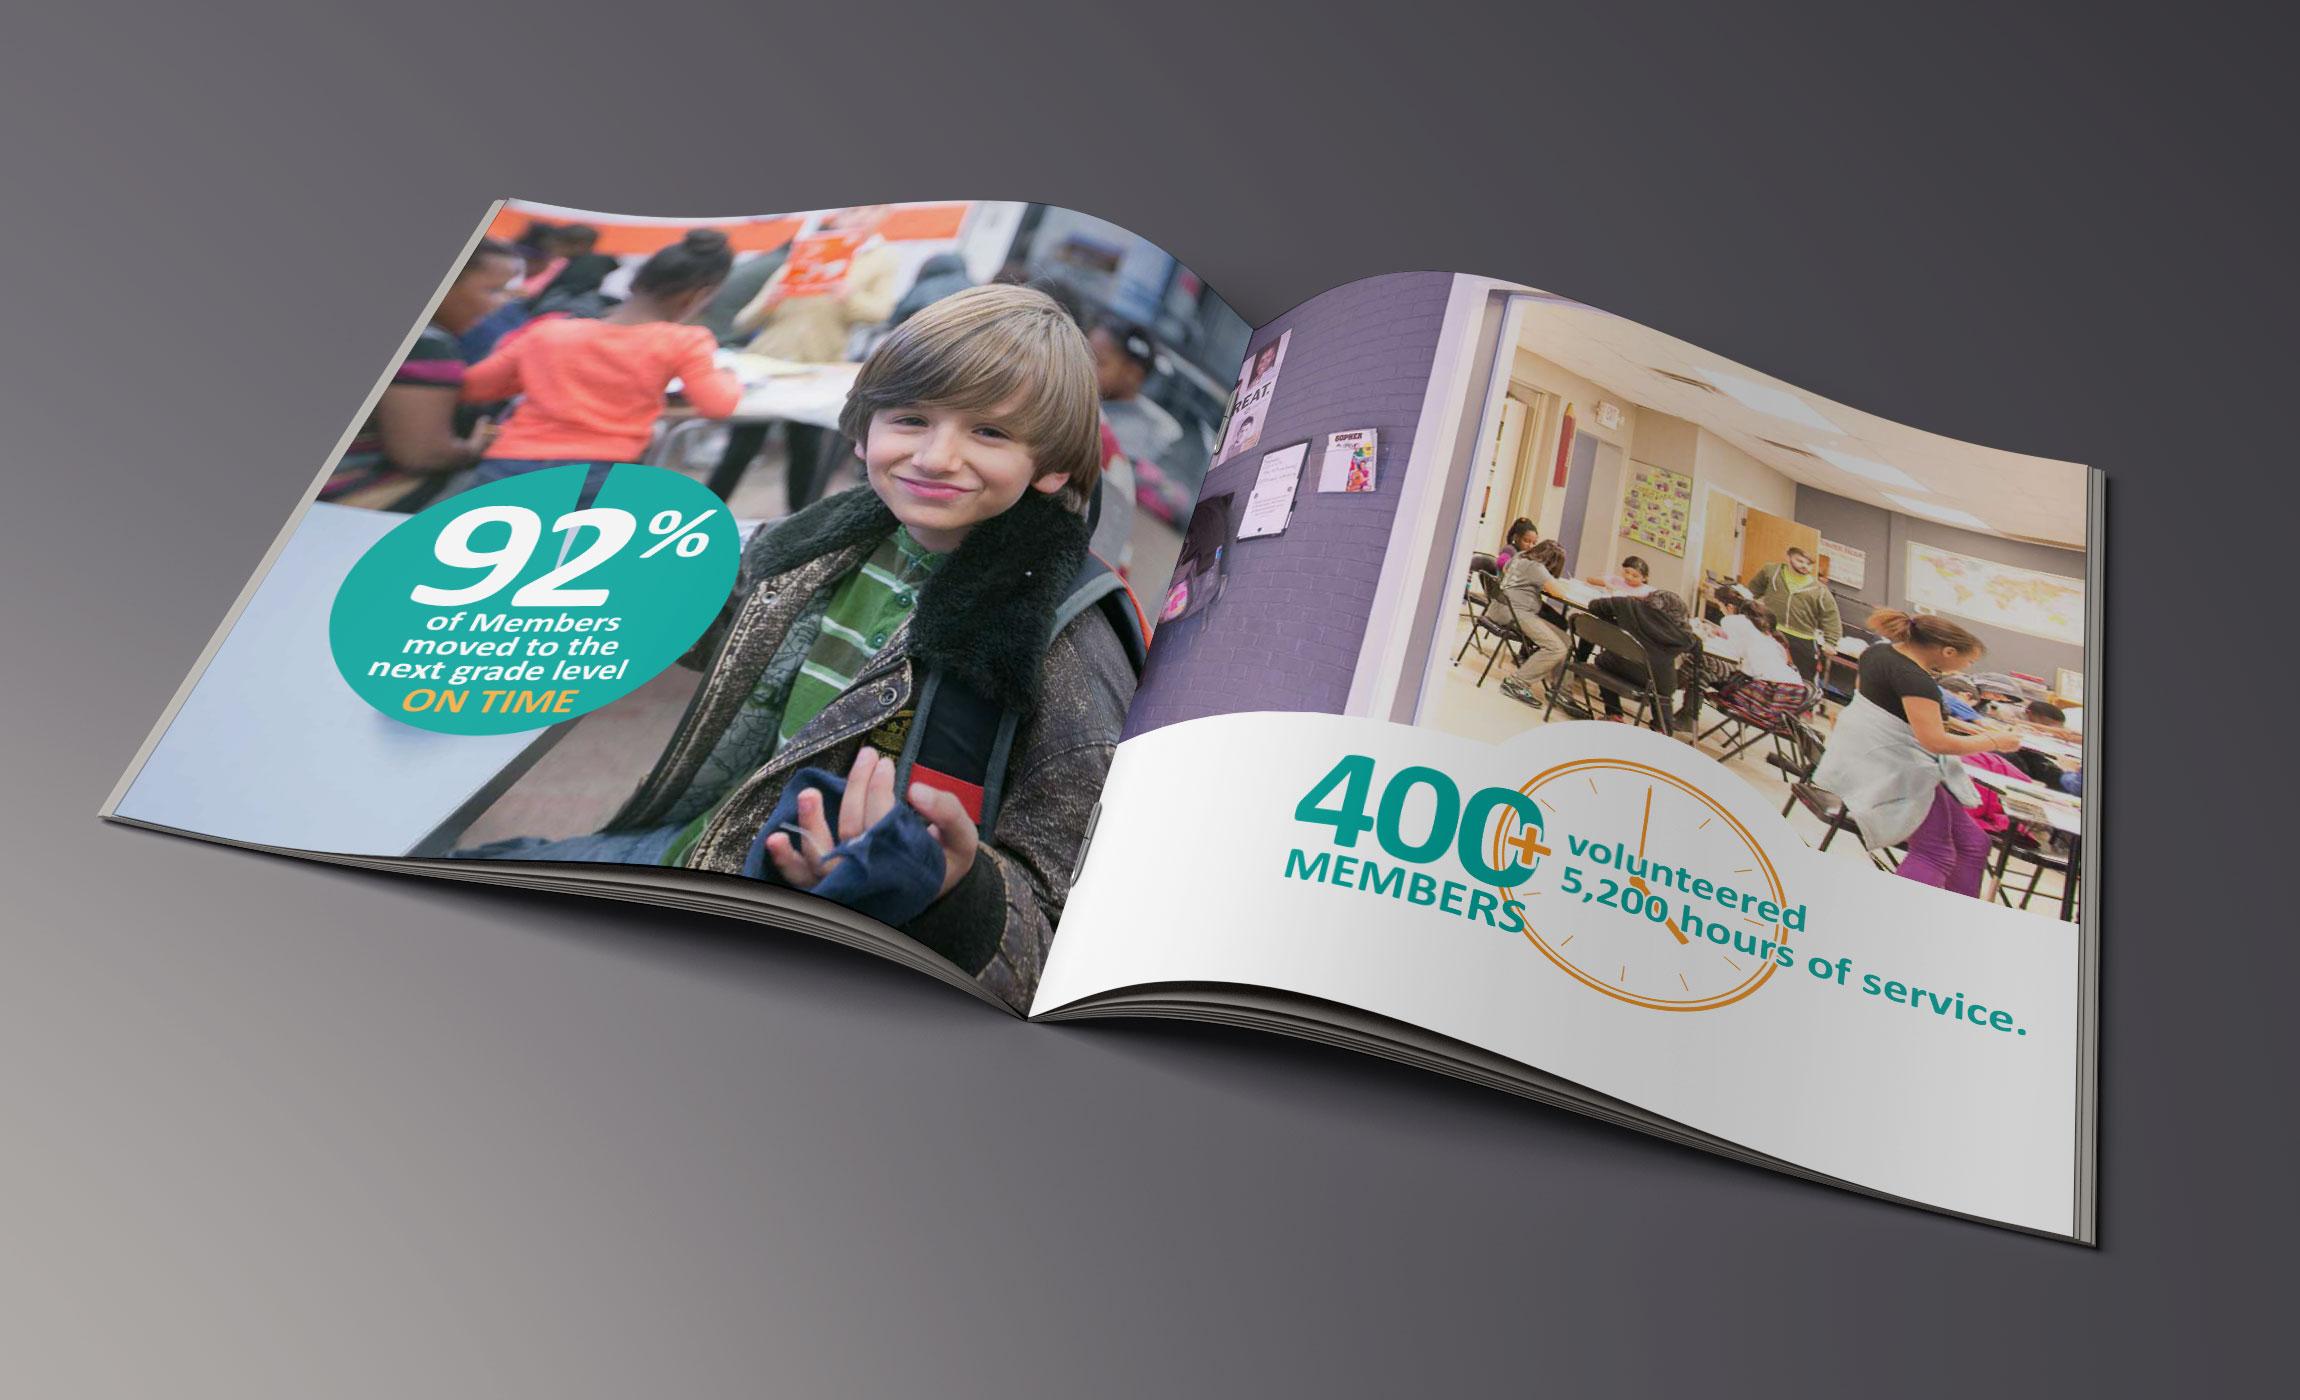 BGC_Mock-up_Brochure_21x21_4.jpg